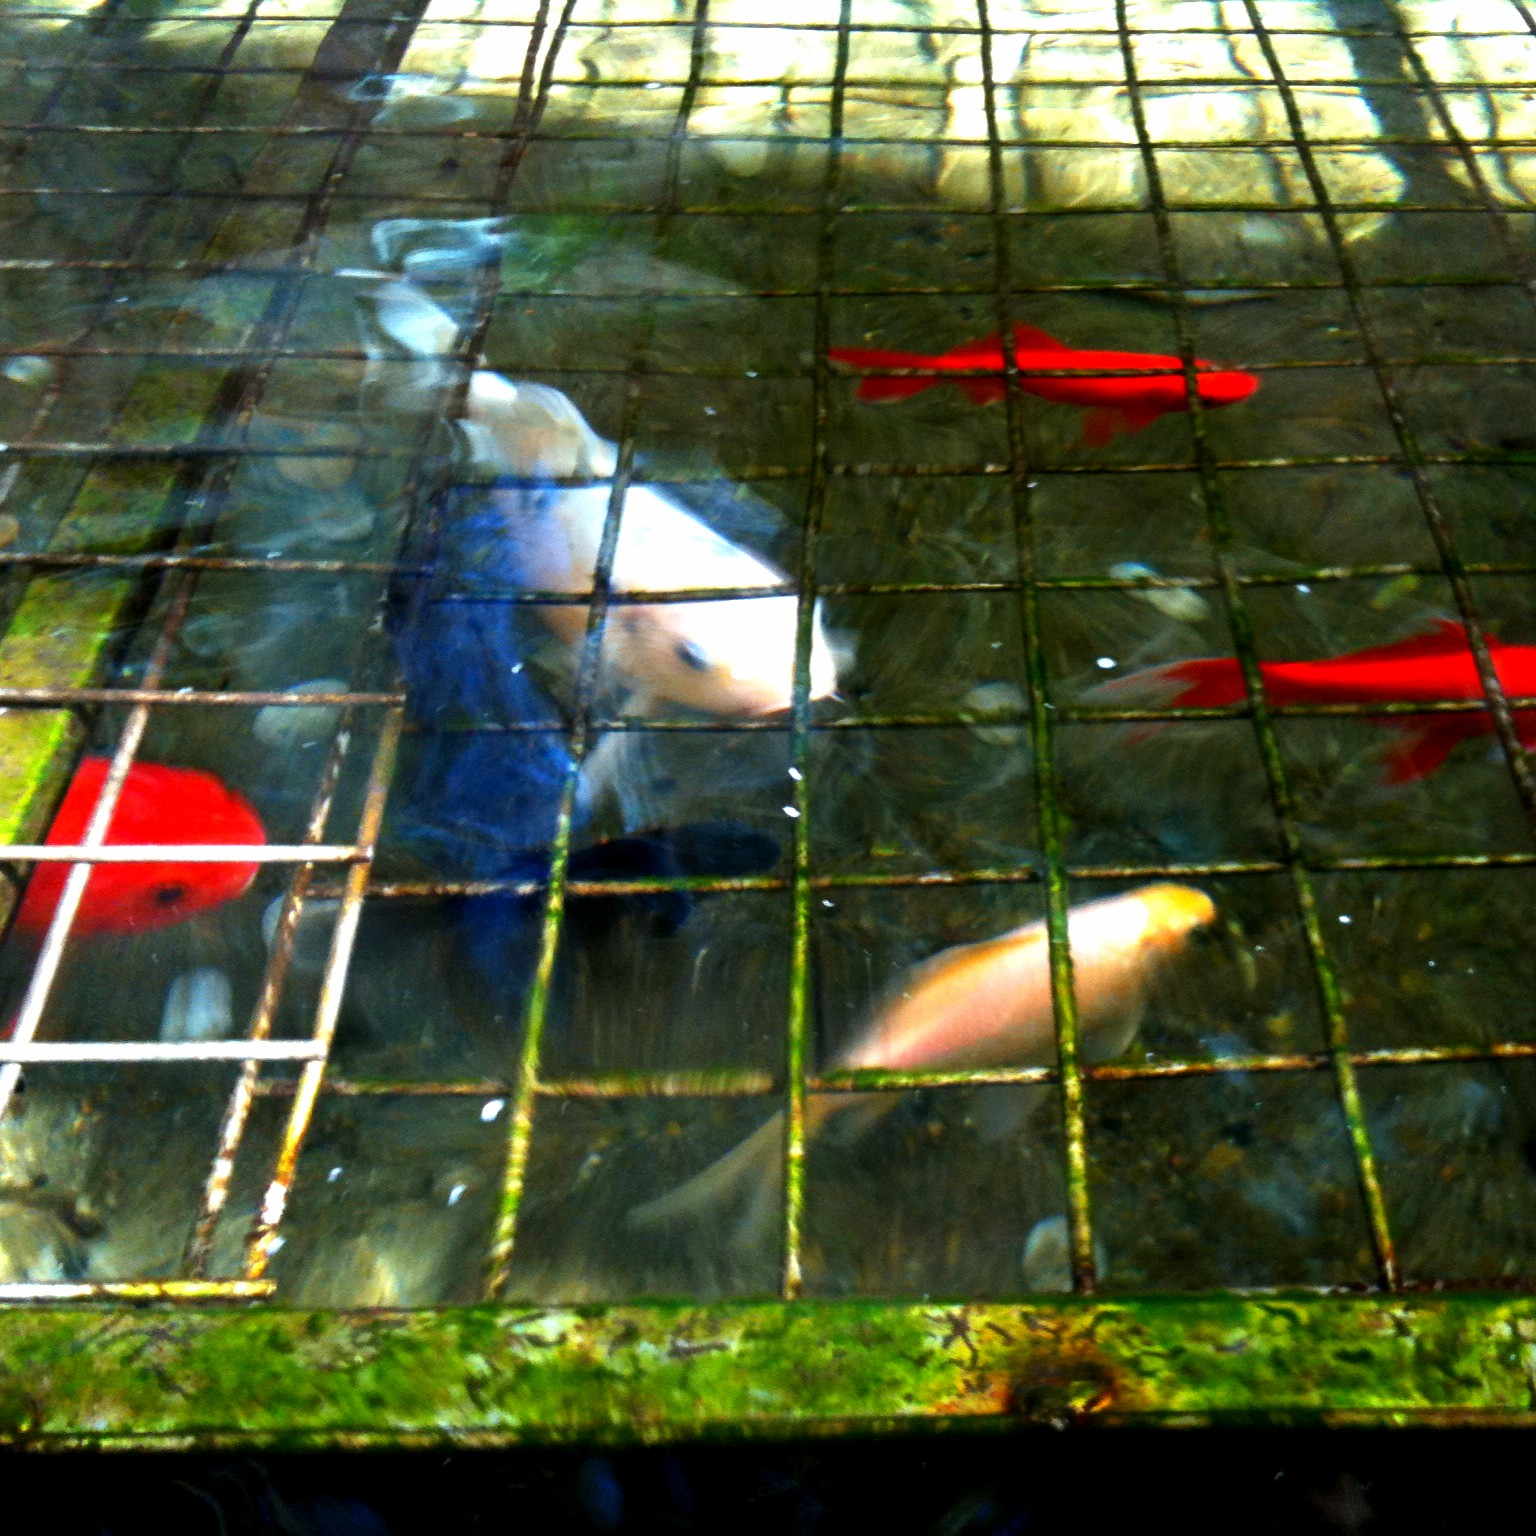 Amazing hospital koi pond flickr photo sharing for Amazing koi ponds